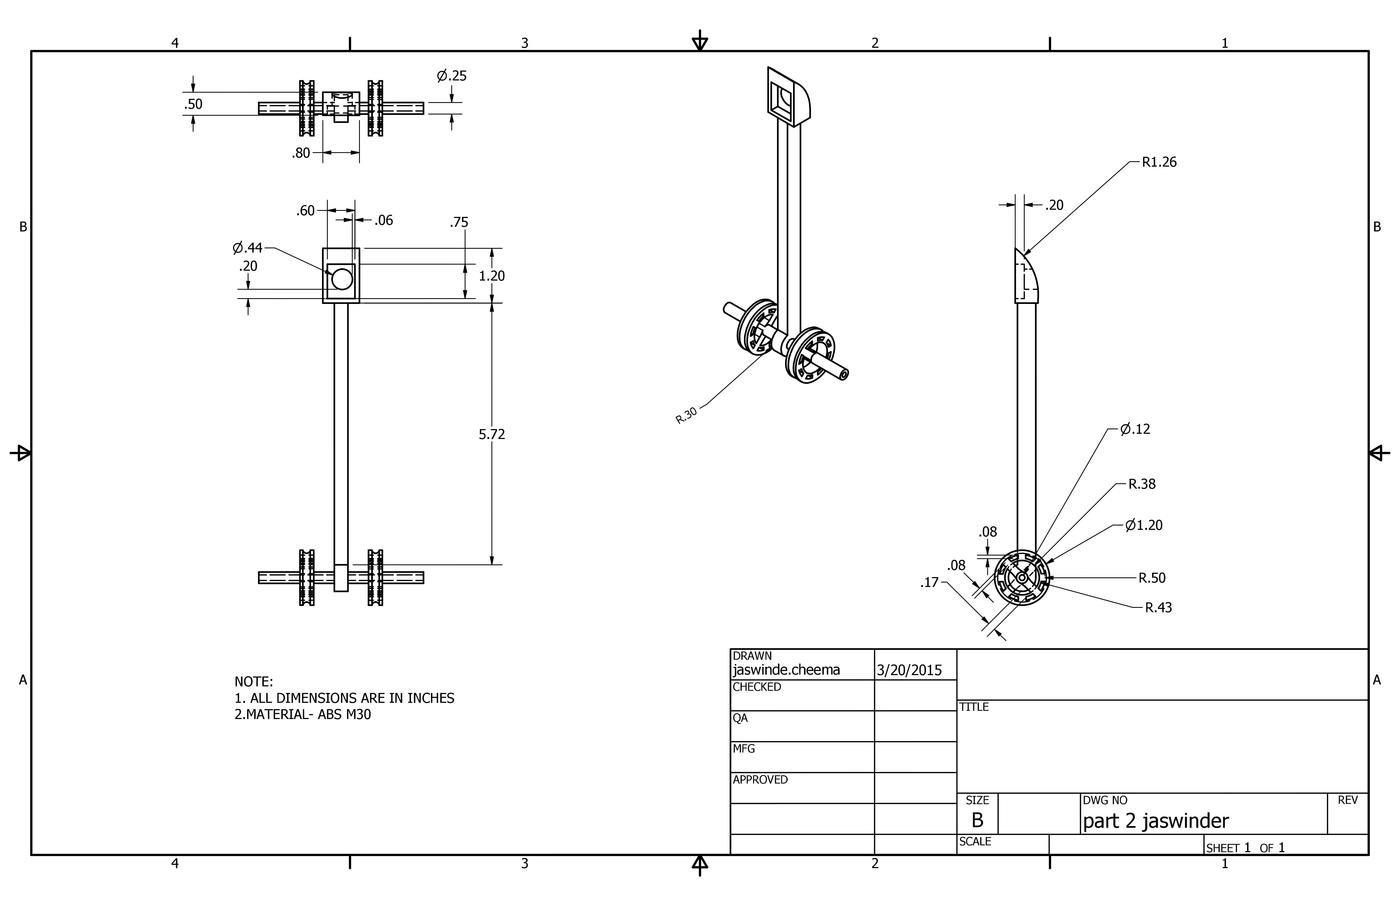 Caddapult Catapult By Jaswinder Cheema At Diagram